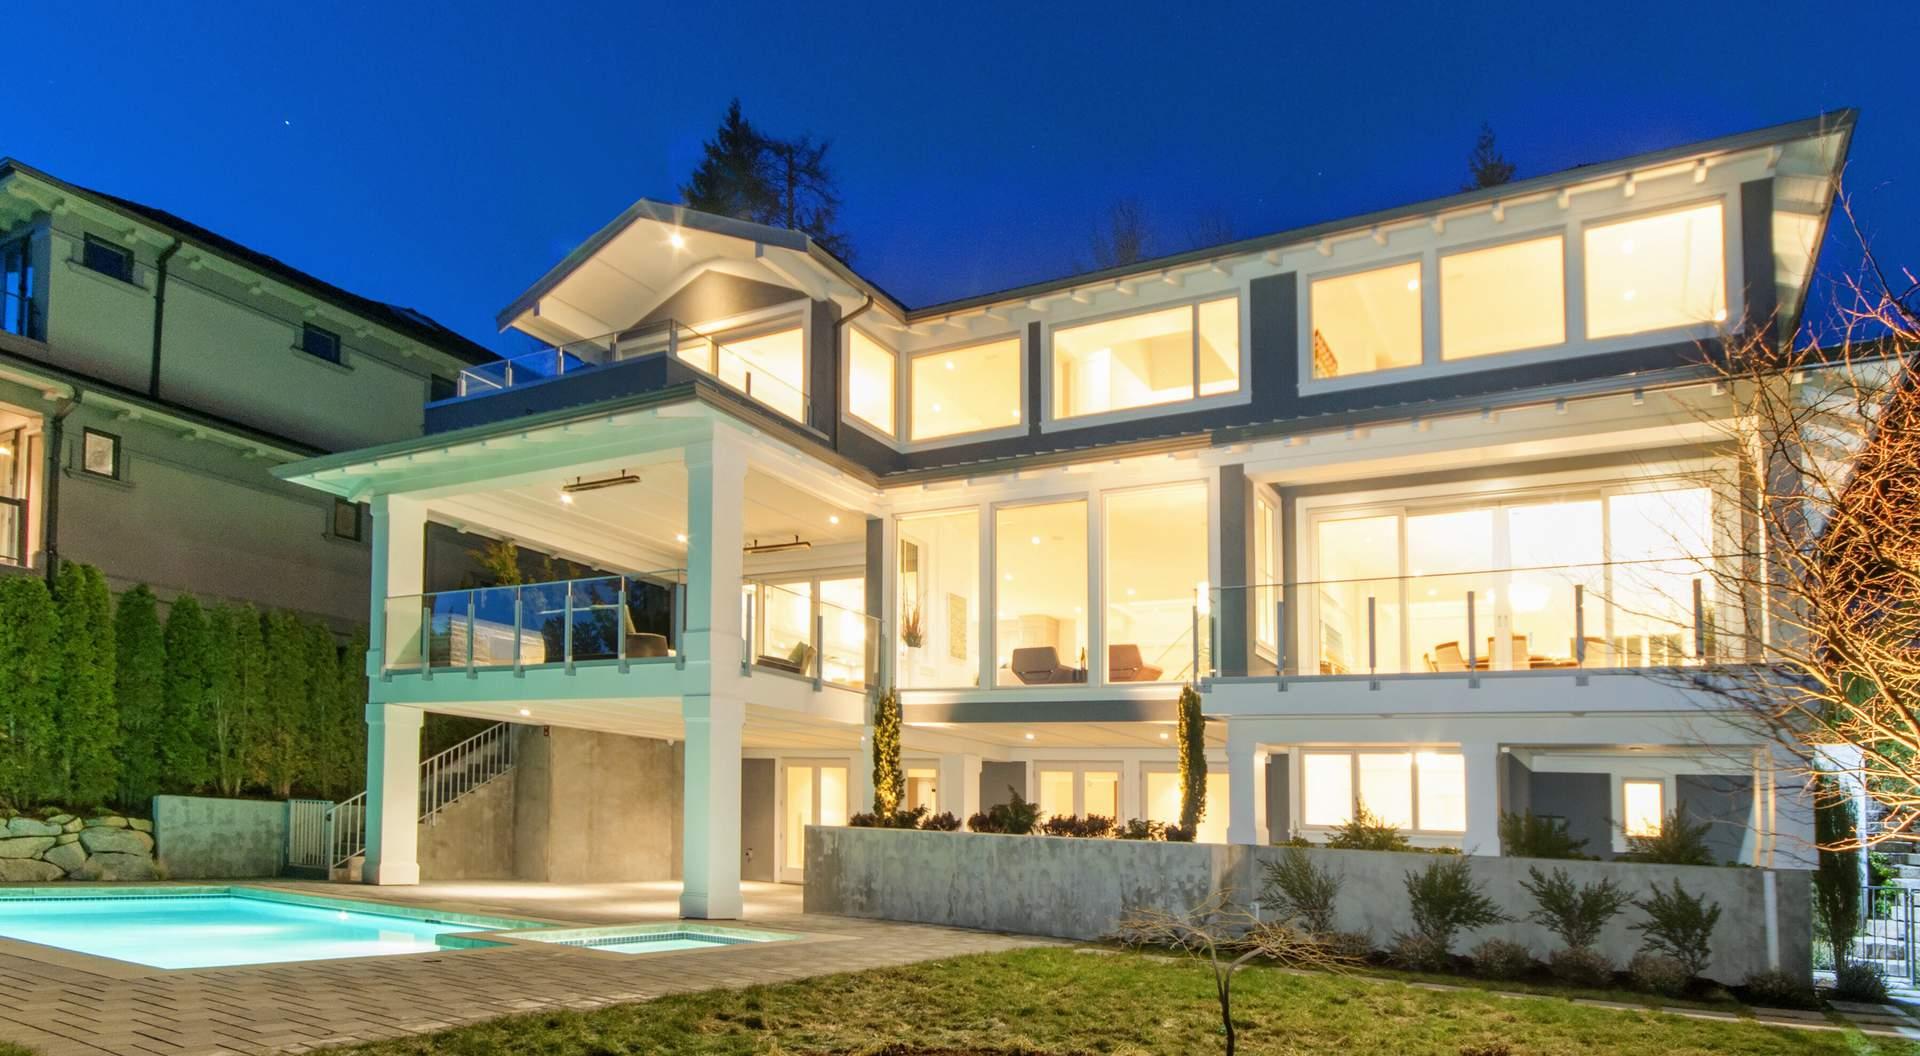 zero net energy modern home design Gambrick custom new home builder Pt Pleasant Beach Ocean County NJ